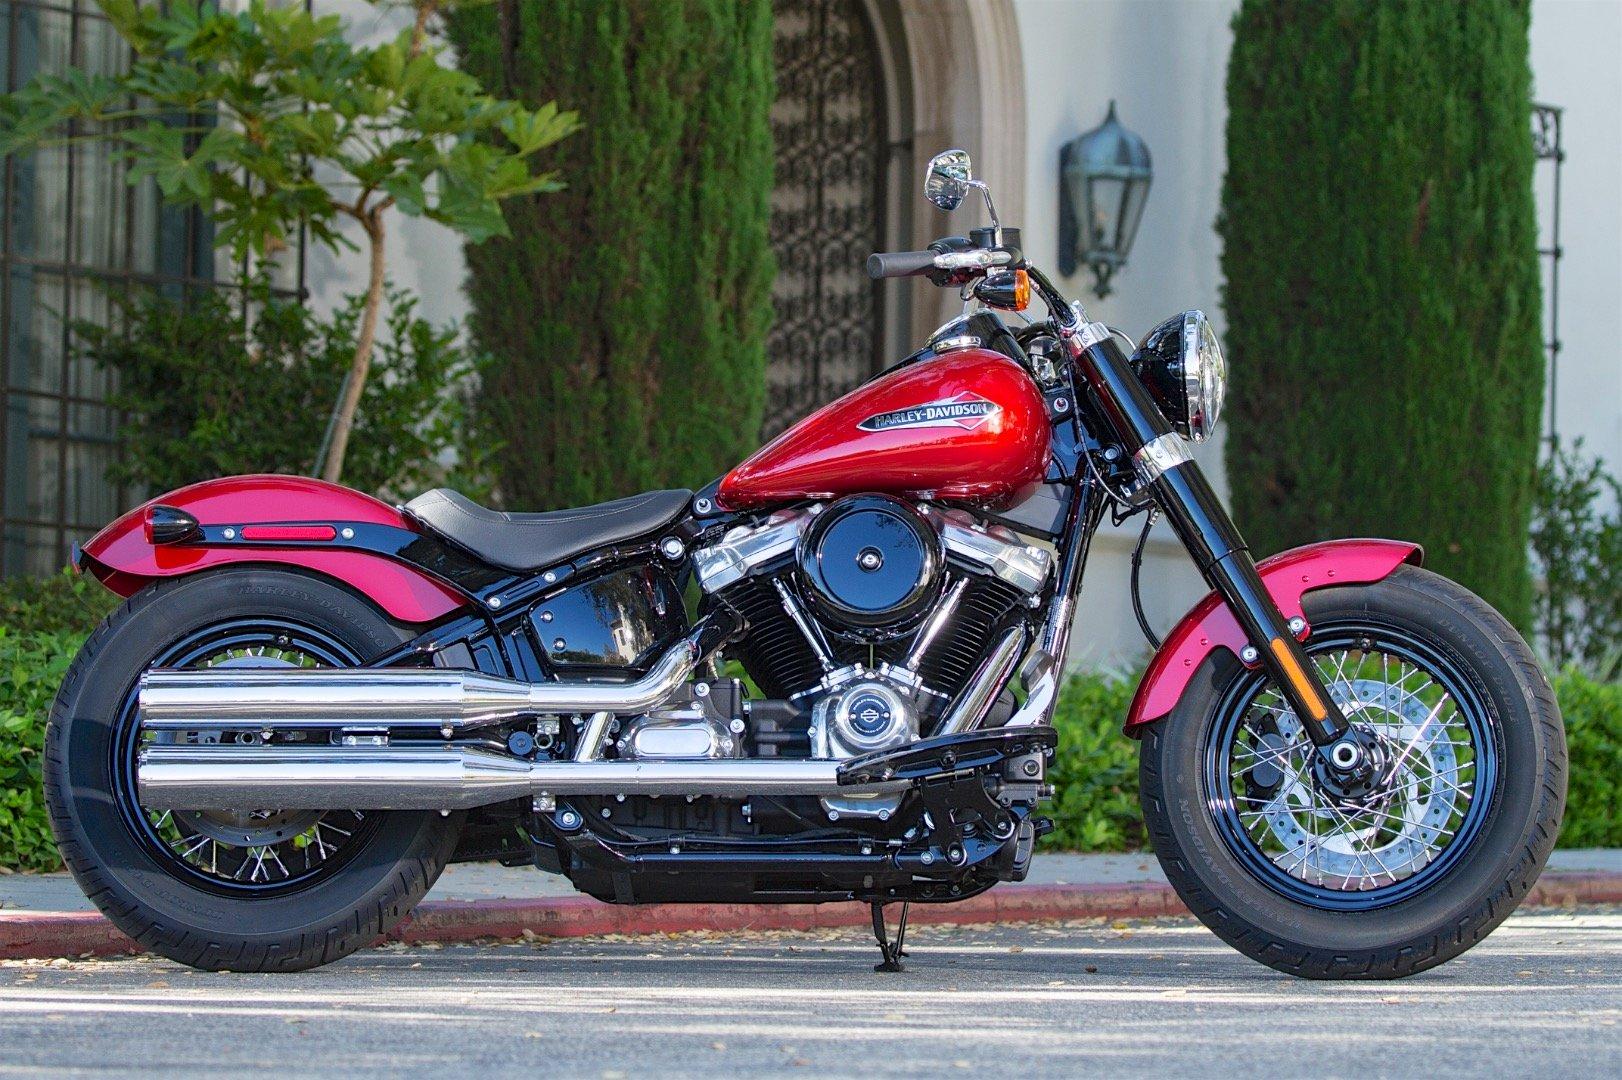 2018 Harley-Davidson Softail Slim price